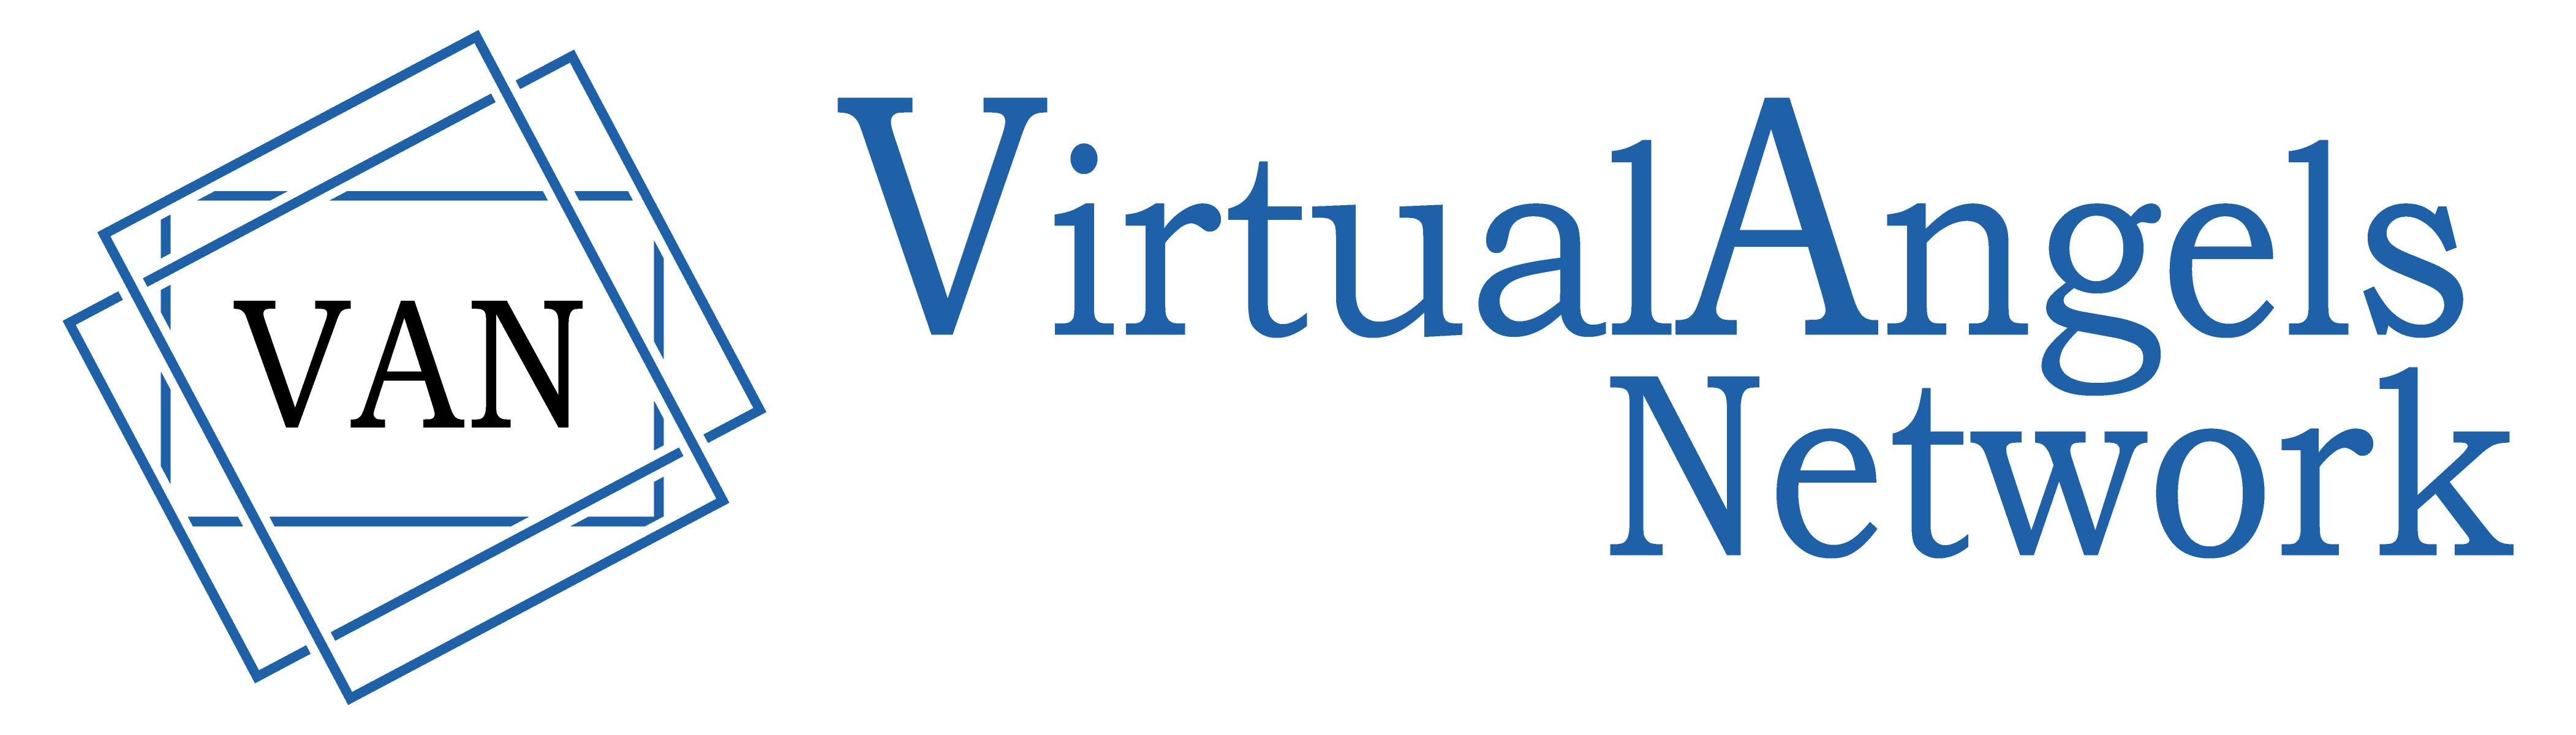 Virtual Angels Network